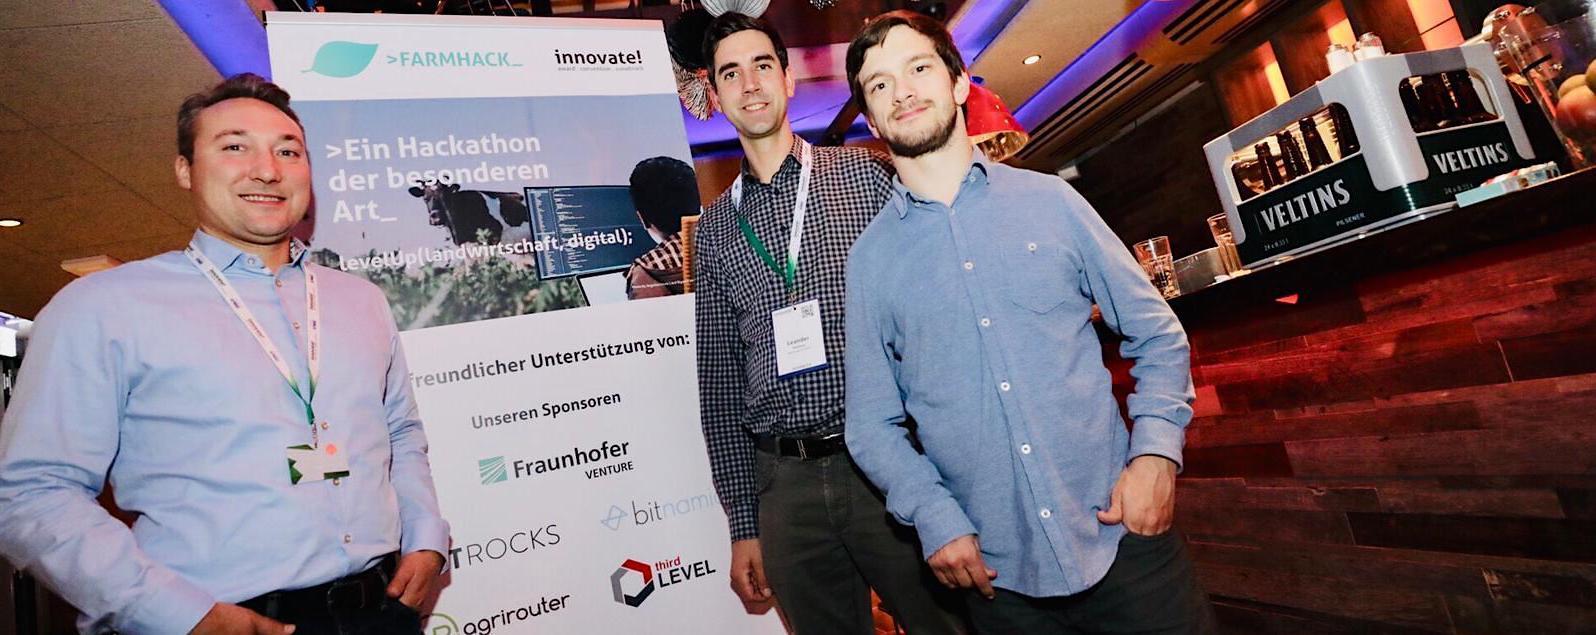 Farmhack – der erste Agrar-Hackathon